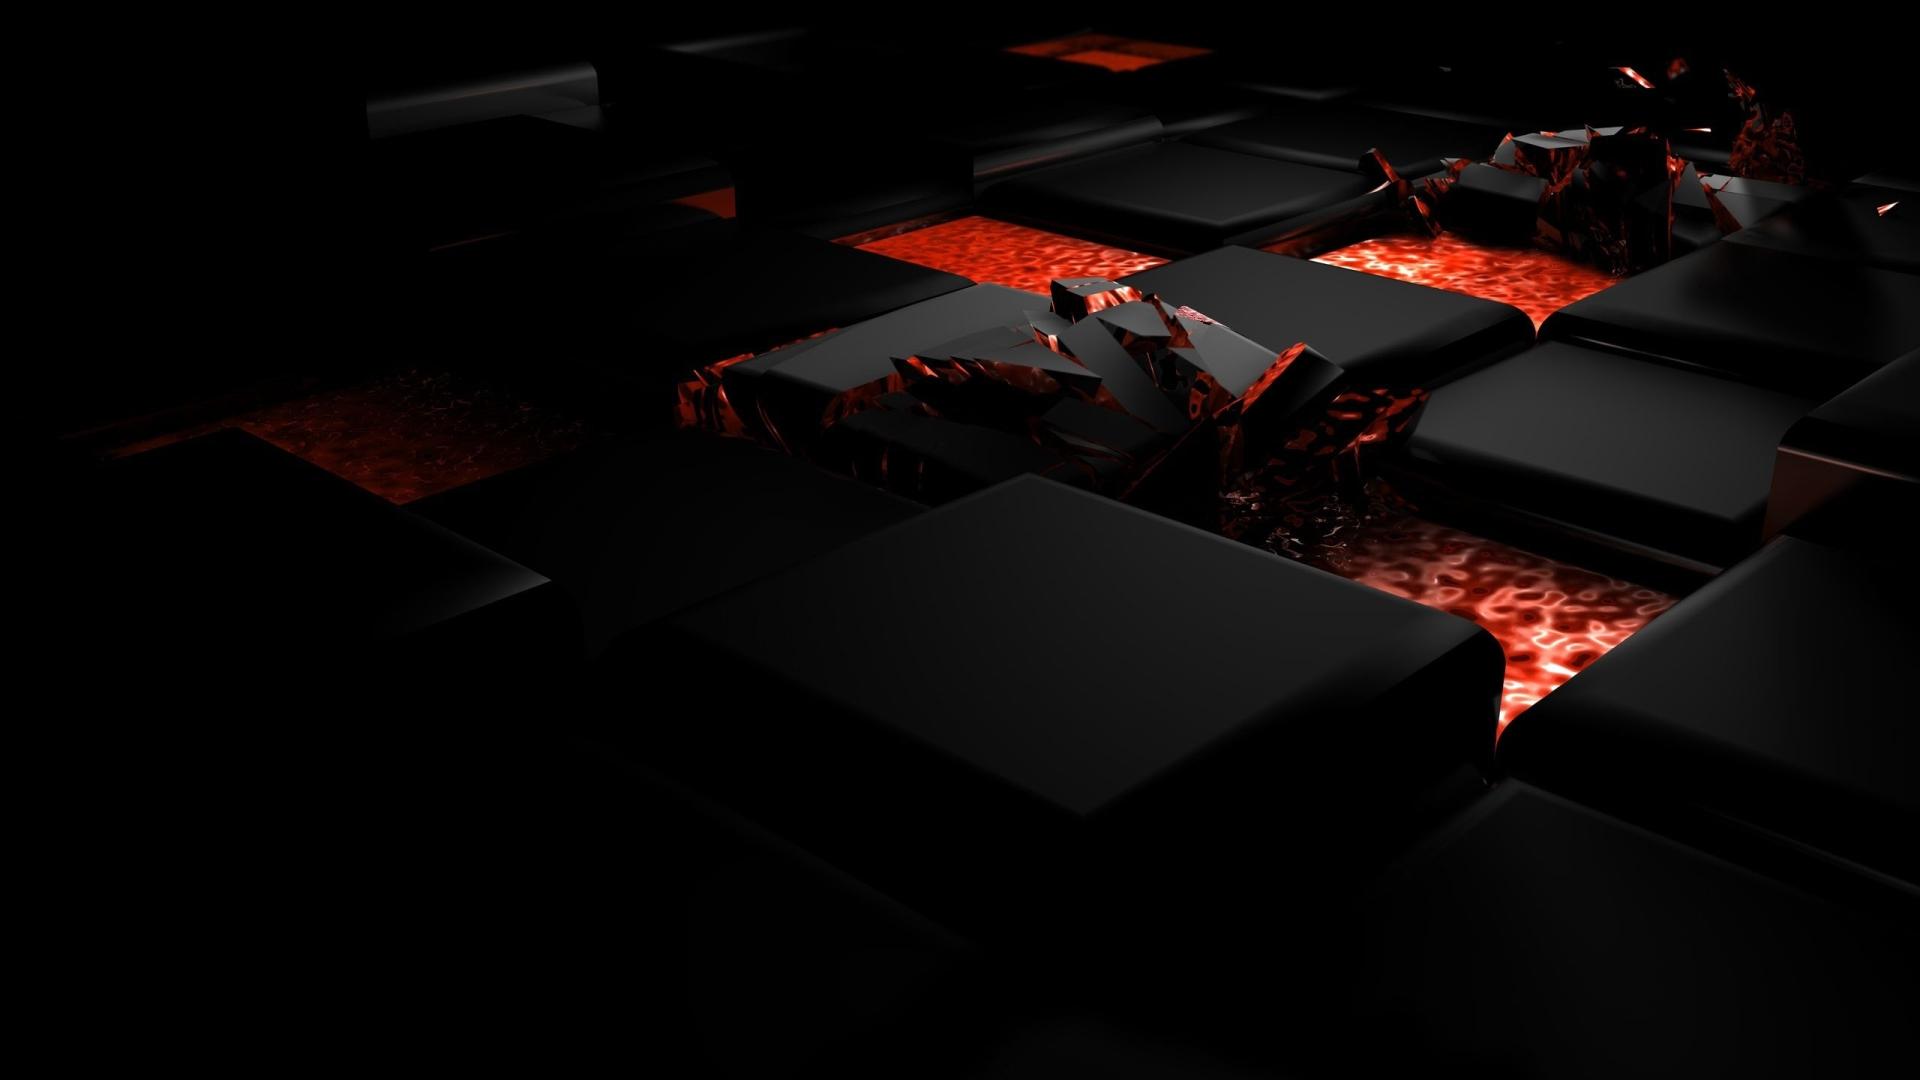 1920x1080 cube, fire, dark 1080P Laptop Full HD Wallpaper ...